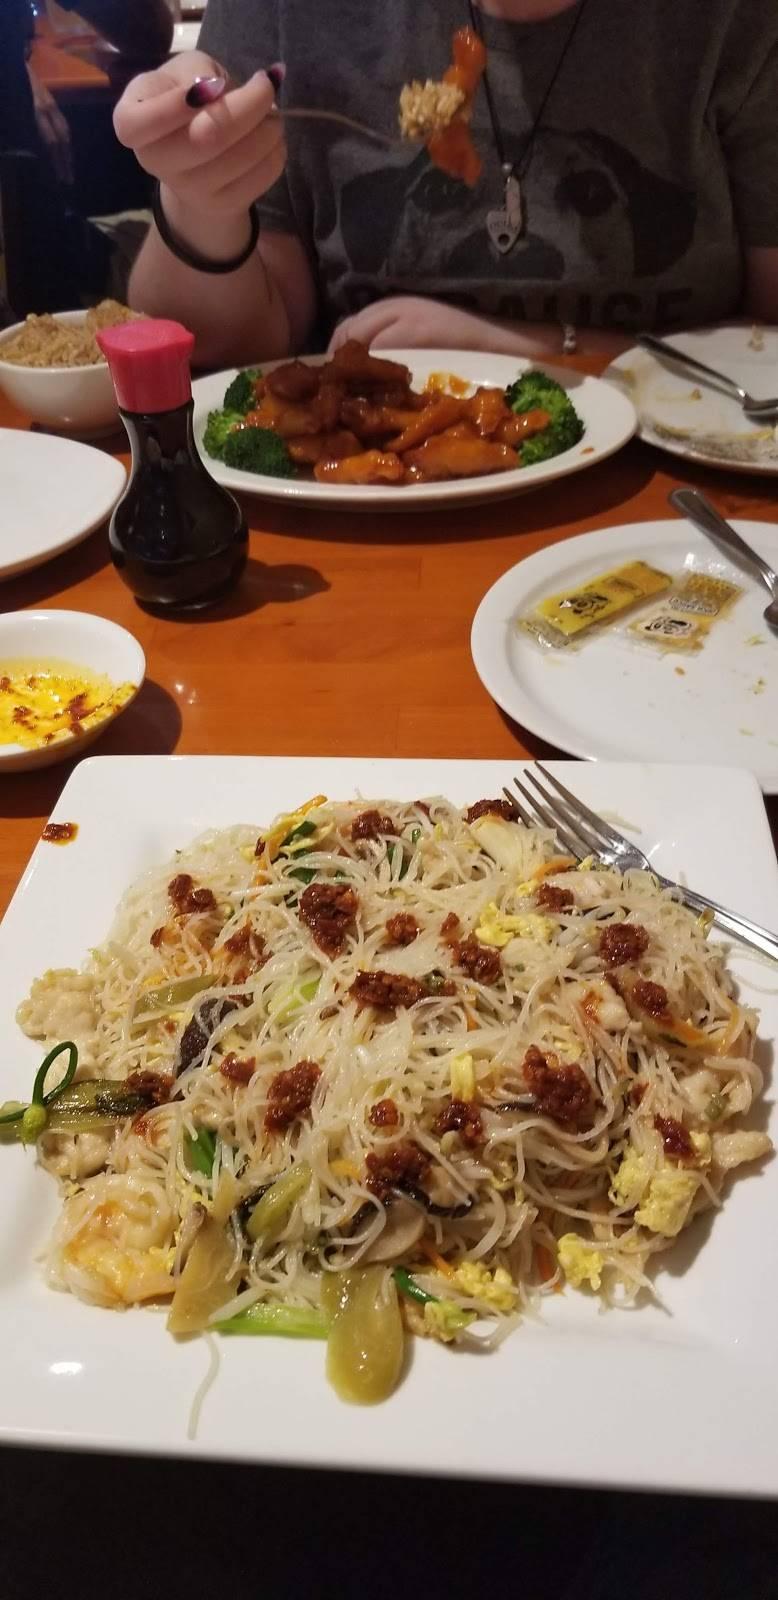 Arbys   meal takeaway   1870 E Santa Fe St, Gardner, KS 66030, USA   9138842955 OR +1 913-884-2955